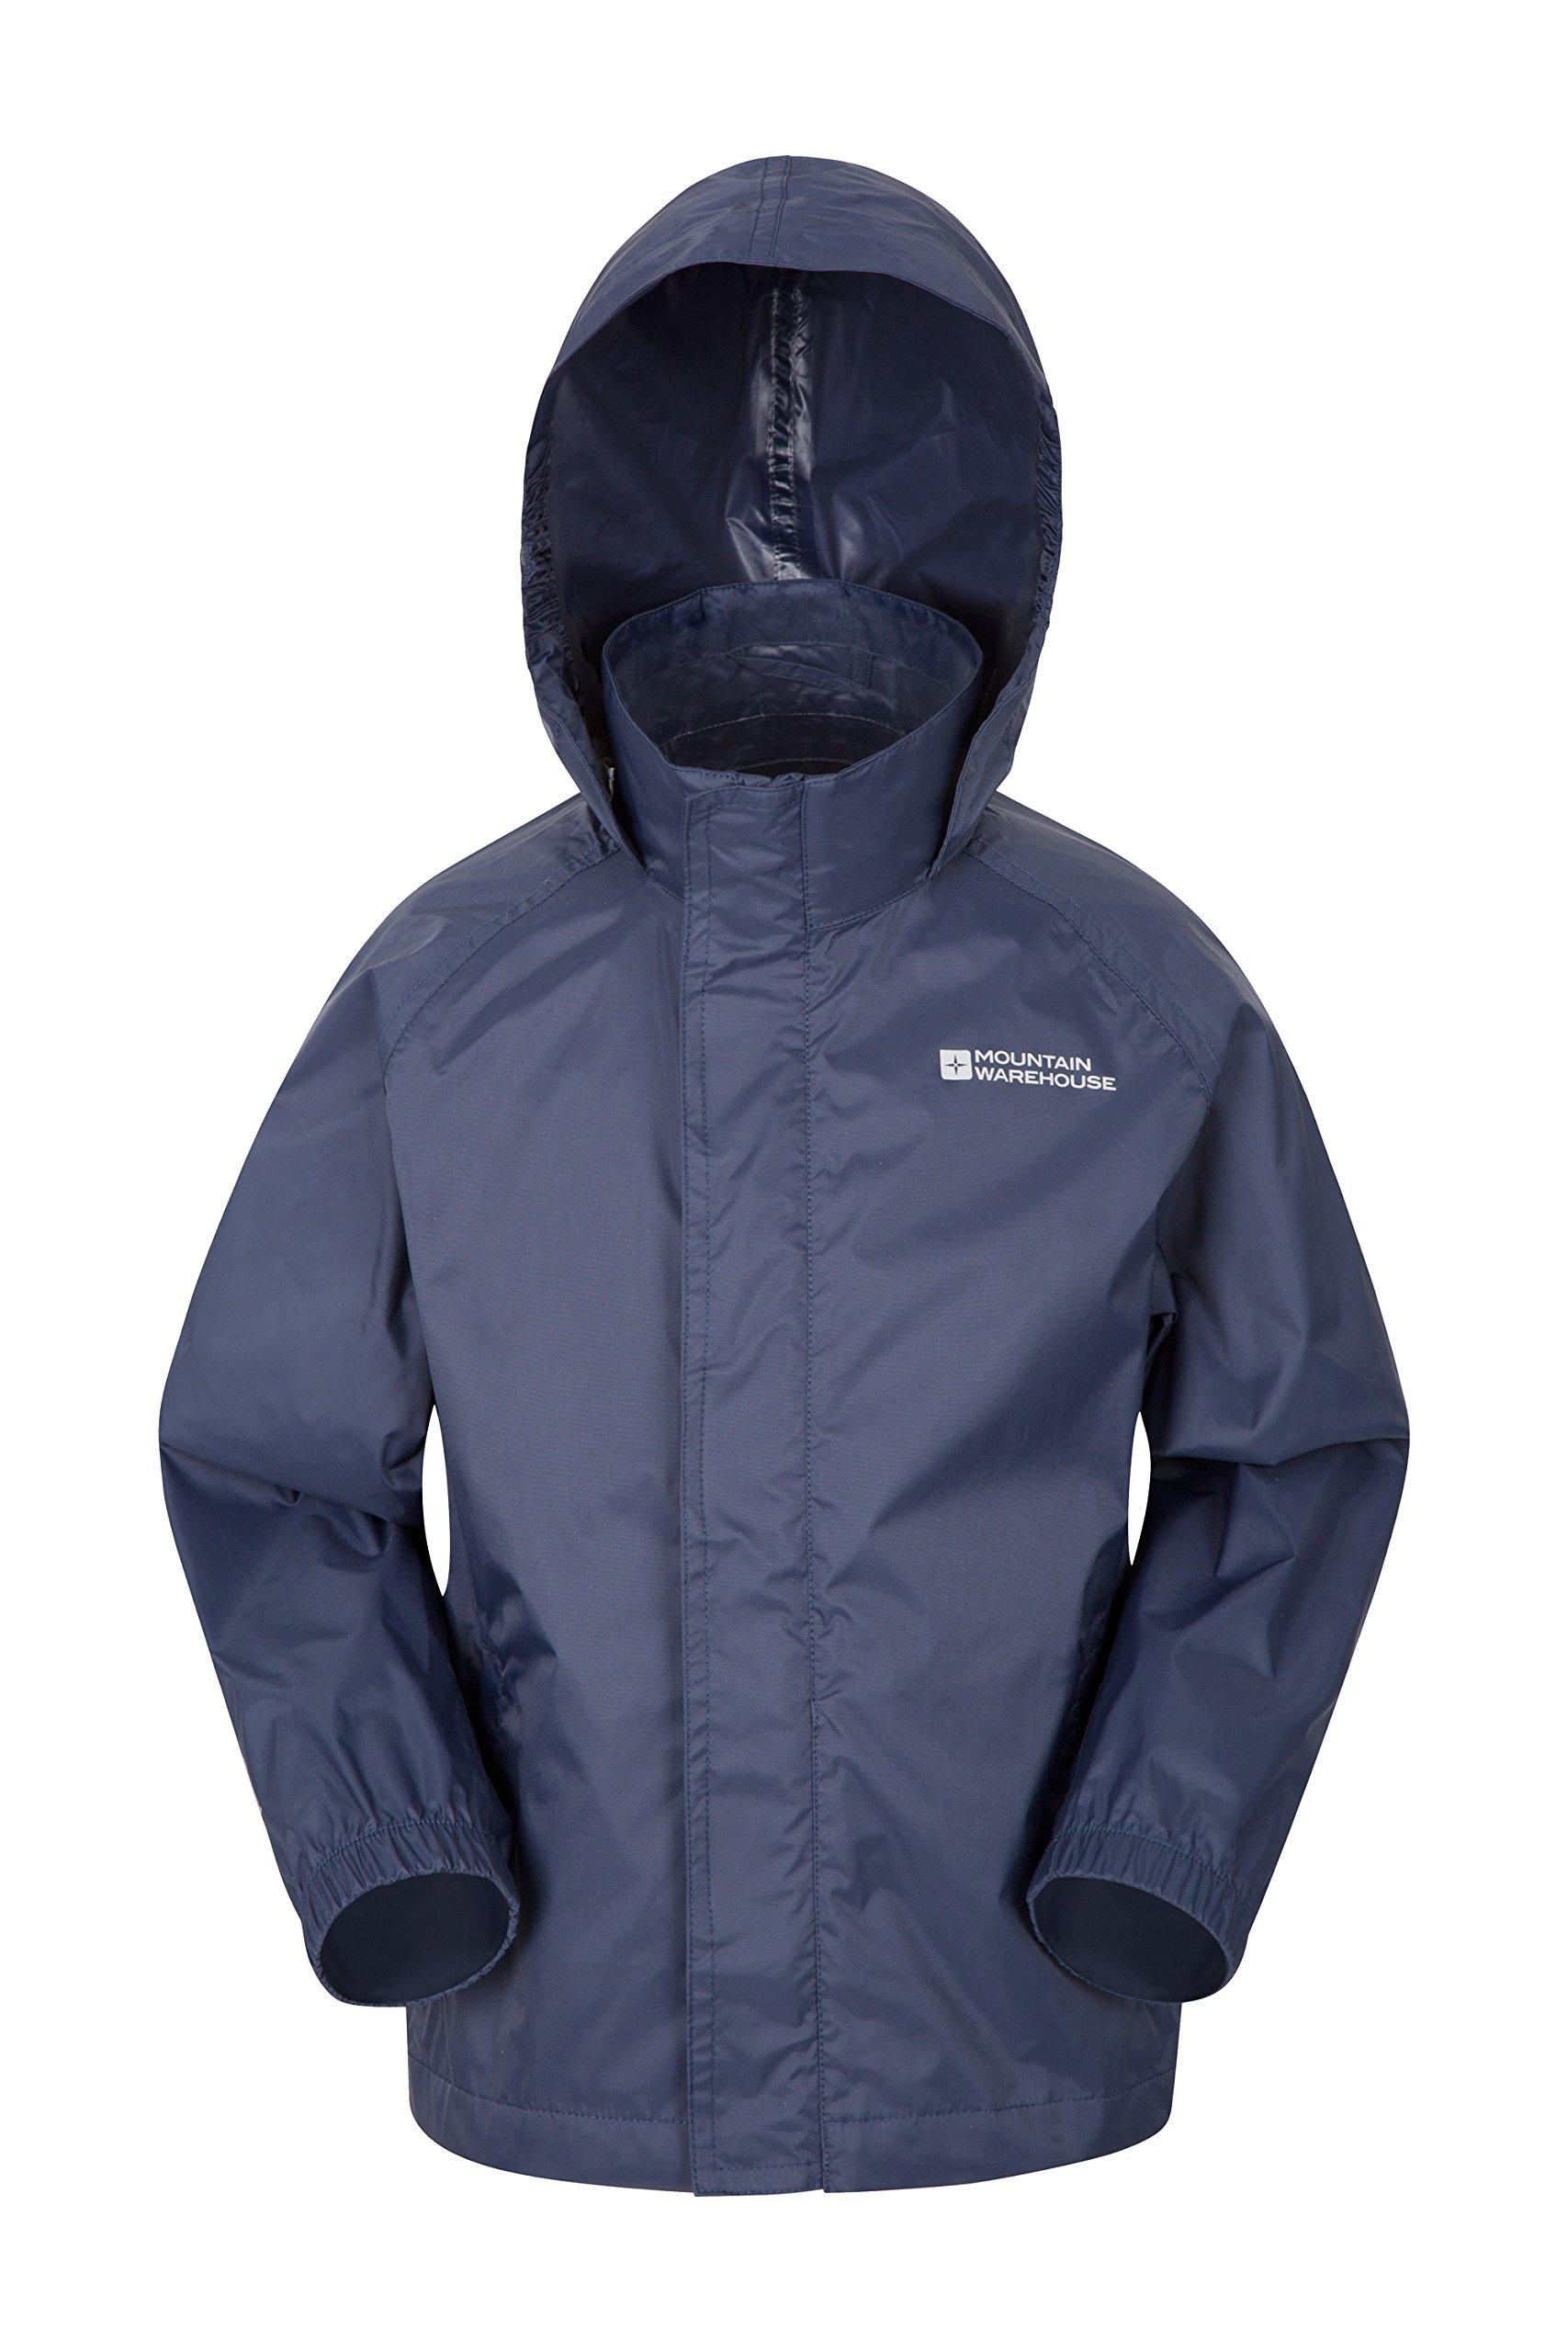 Mountain Warehouse Pakka Kids Rain Jacket - Waterproof, Packable Dark Blue 7-8 Years by Mountain Warehouse